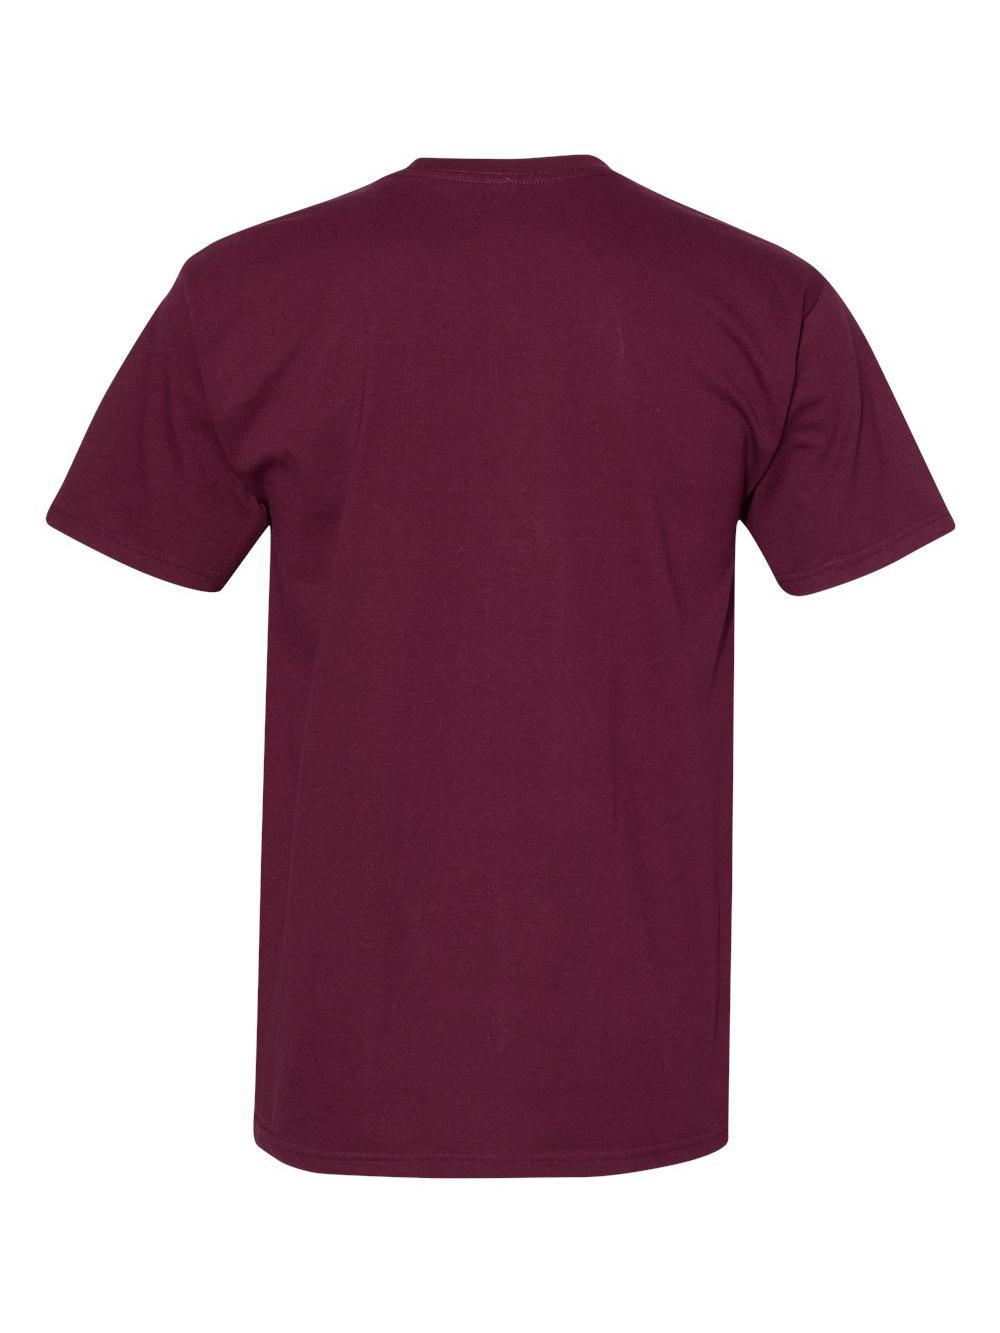 ALSTYLE-Premium-T-Shirt-1701 thumbnail 13